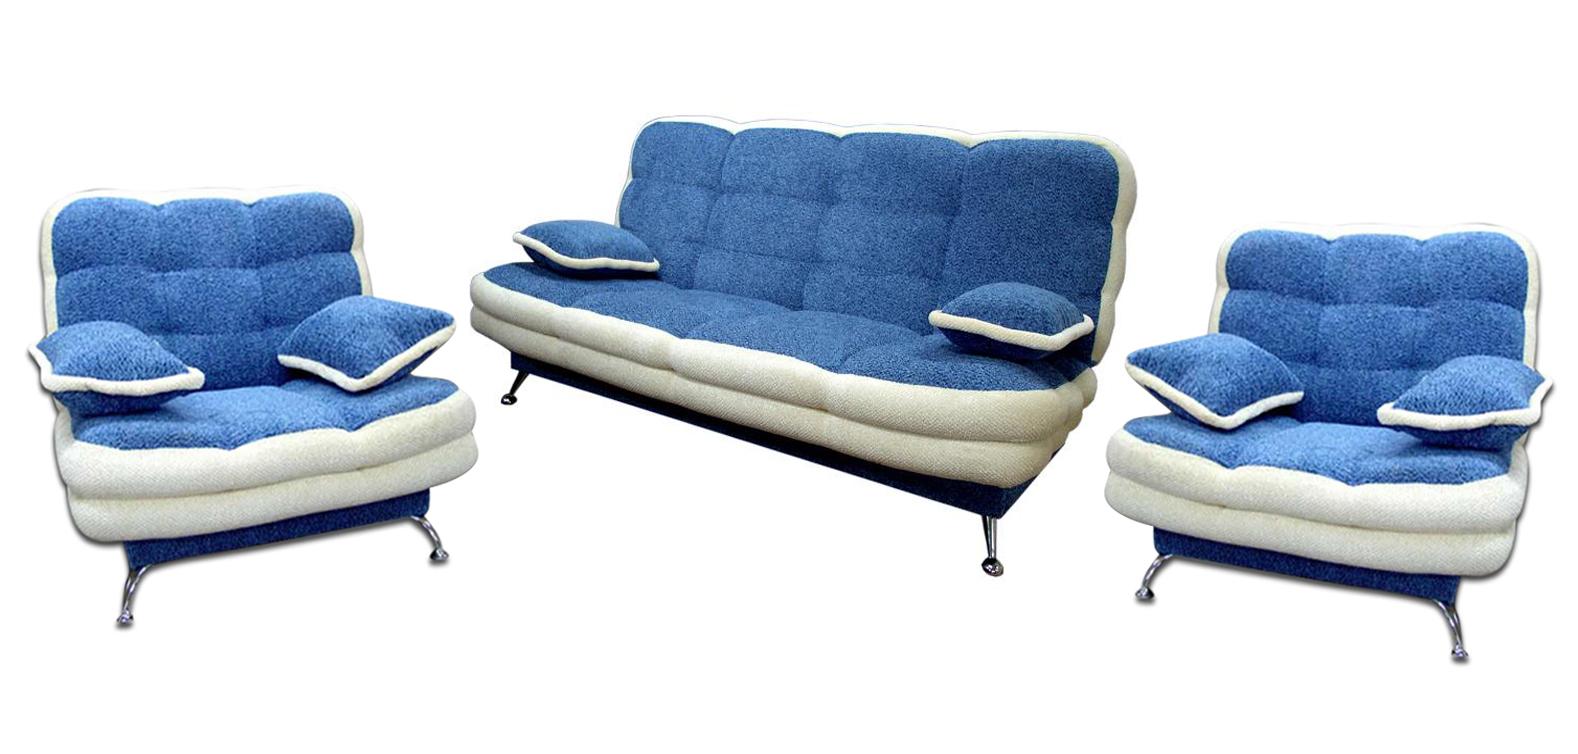 Комплект мягкой мебели Вента-1 3+1+1 Утин Размер: диван: 210х100 (сп. м. 145х210); кресло: 110х110